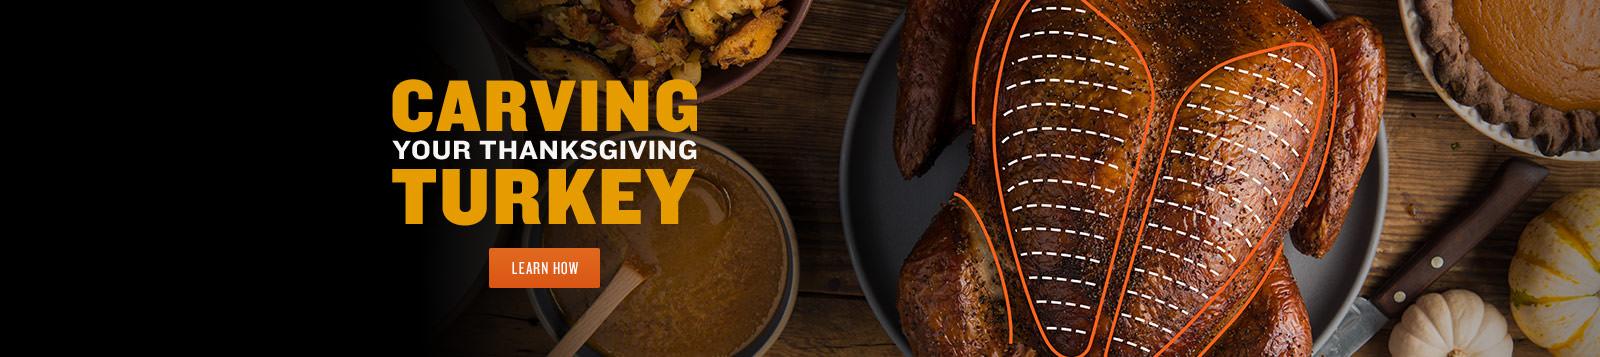 Thanksgiving Turkey Carving